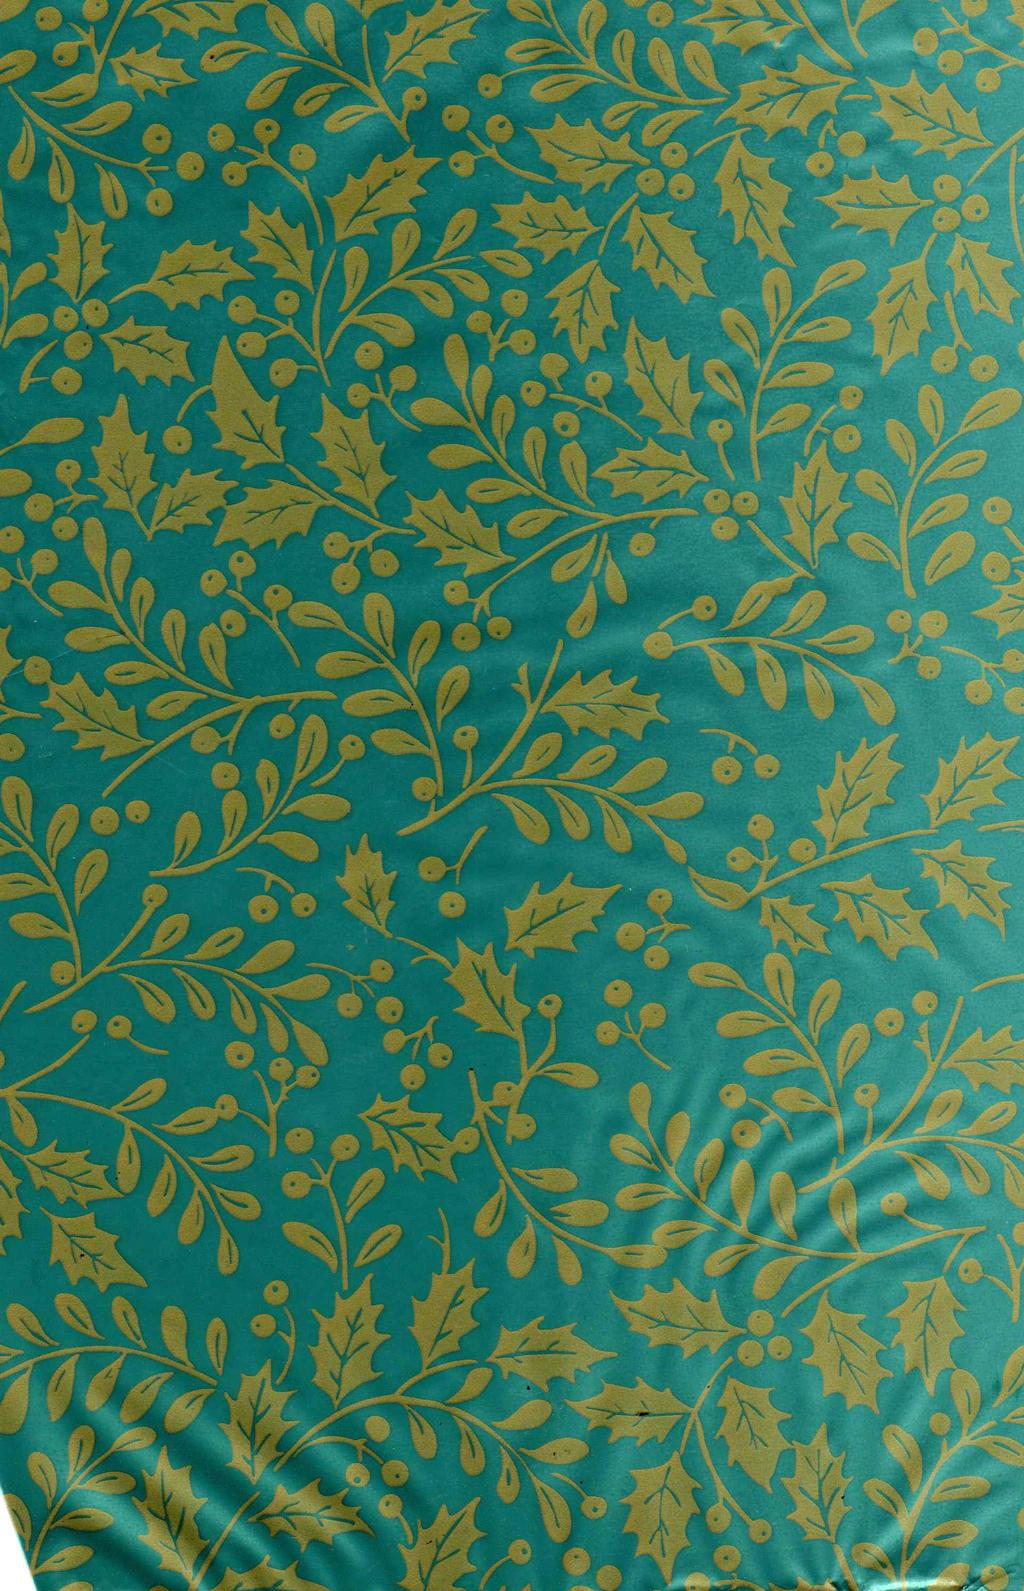 Teal mistletoe gift wrap texture